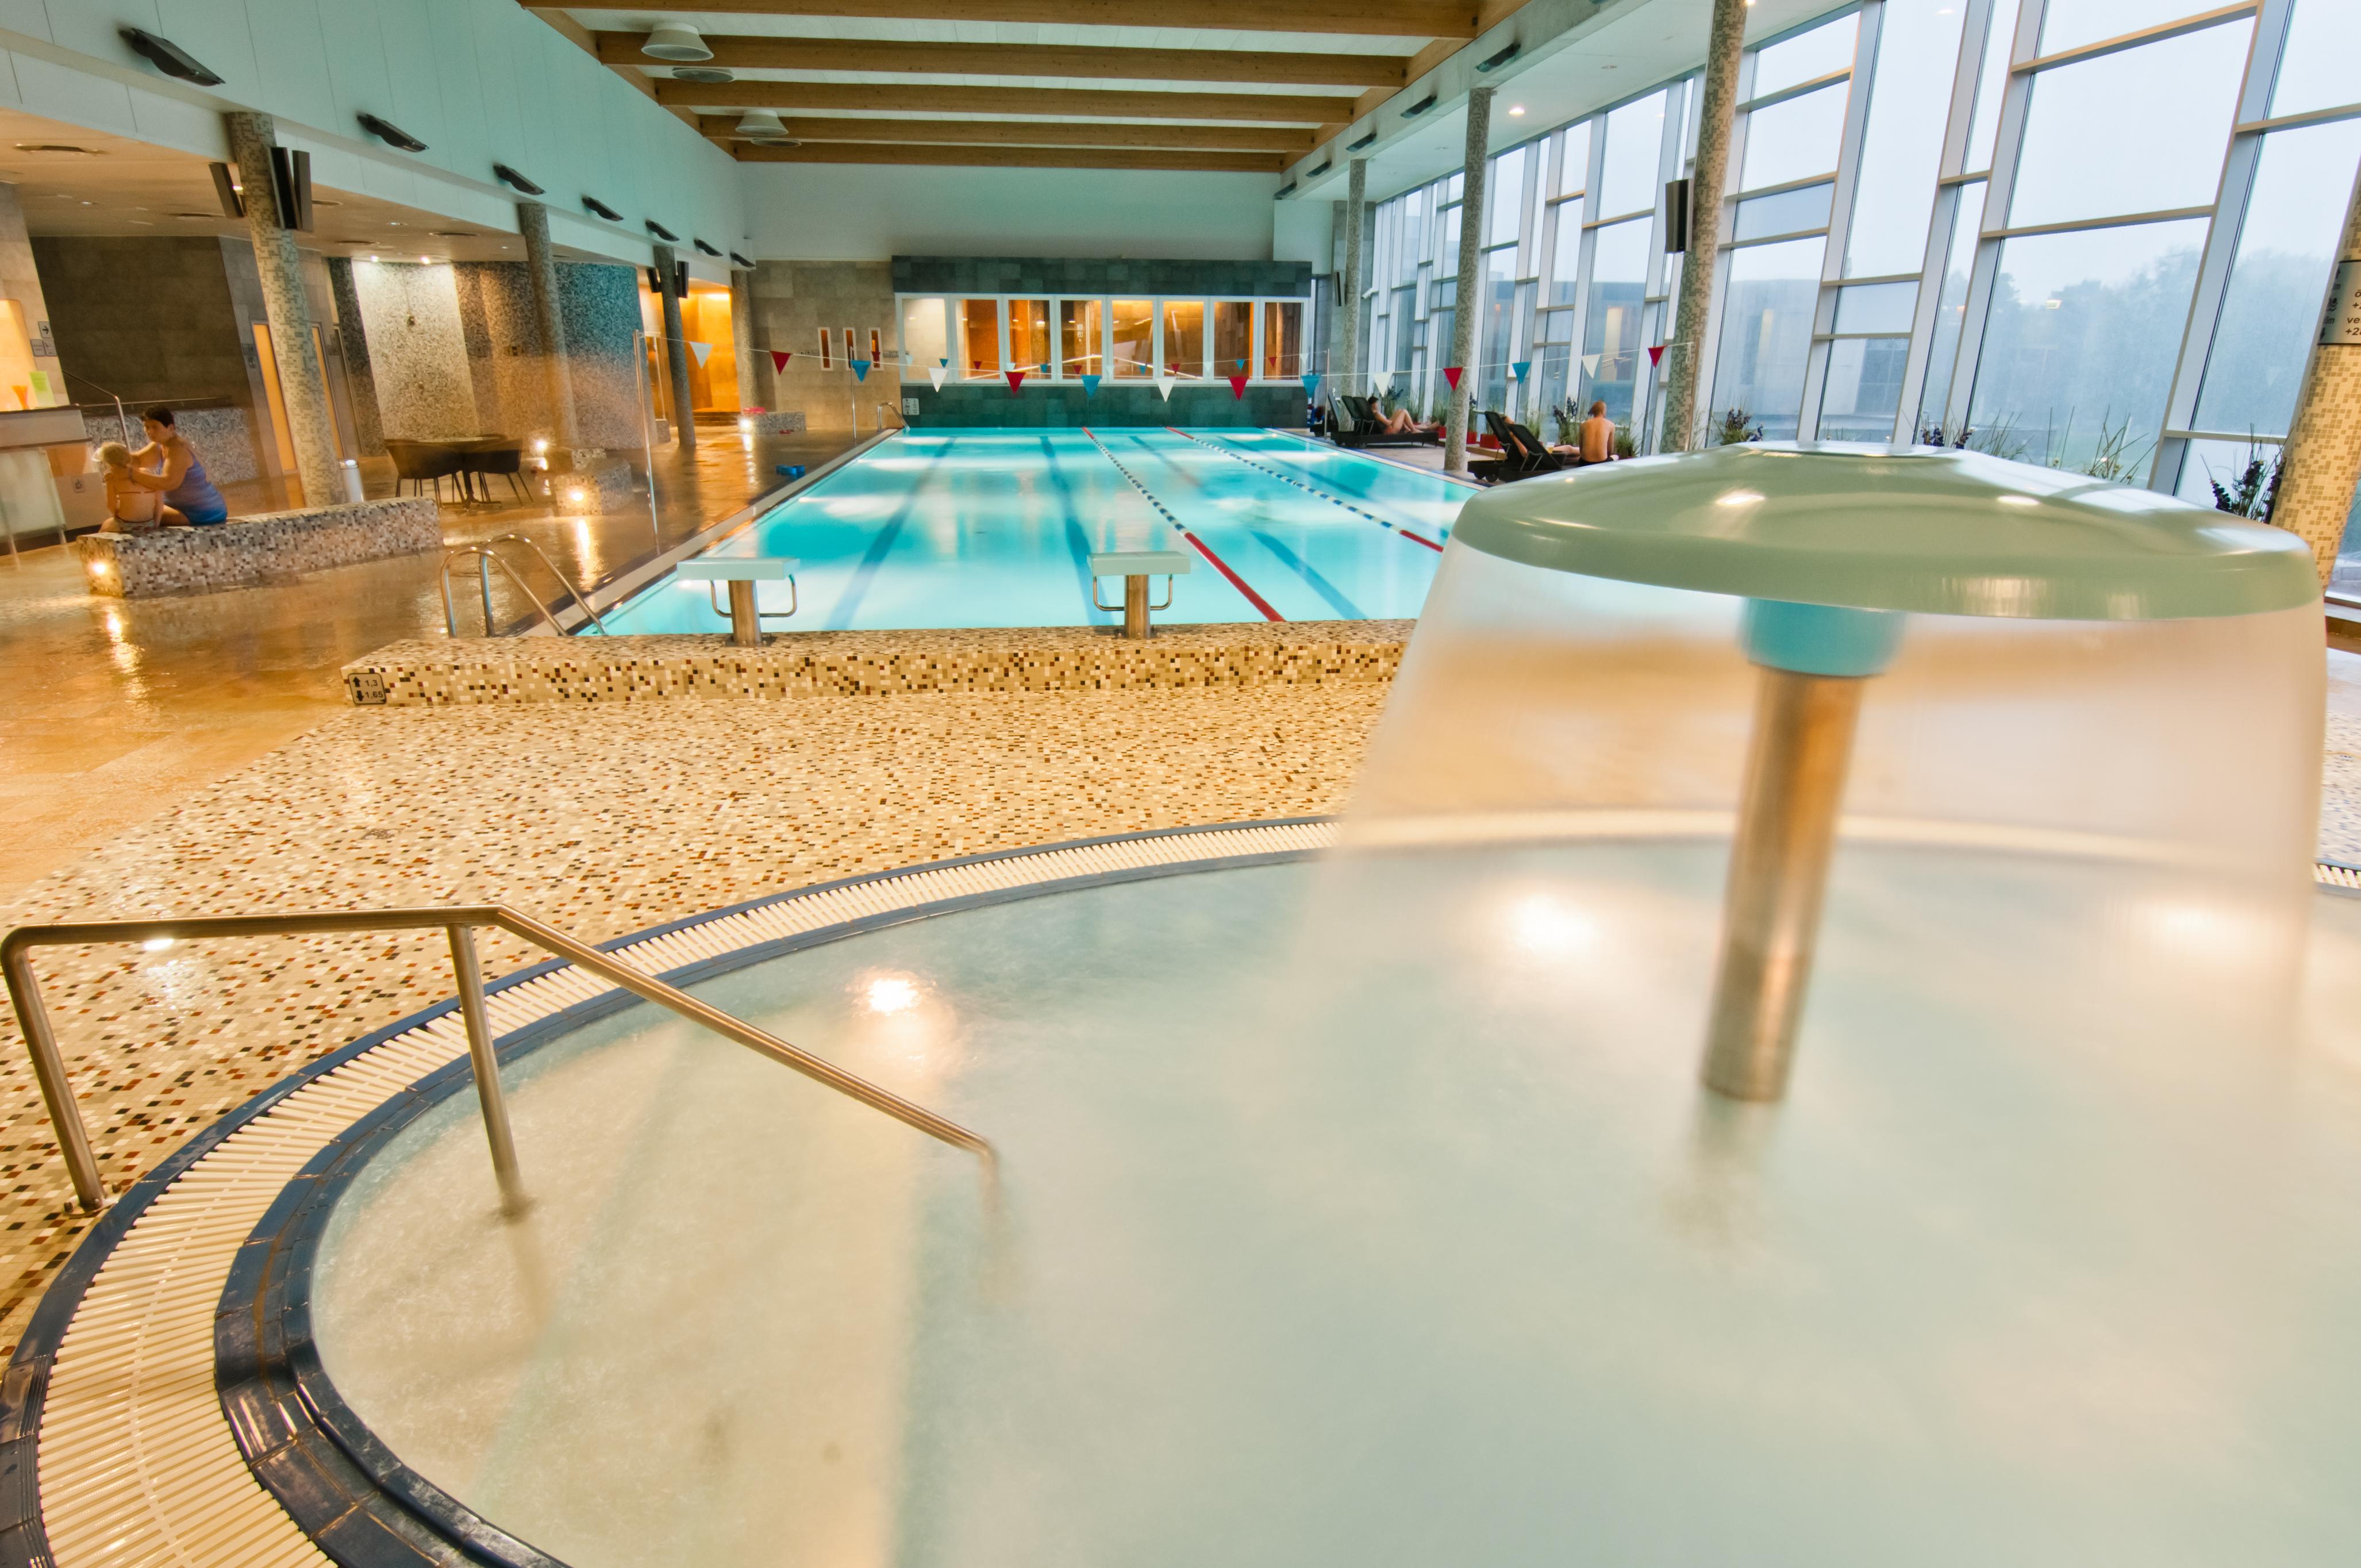 c18e8e610dc Tervis Medical Spa Hotel in Pärnu, Estonia - Spas in Estonia